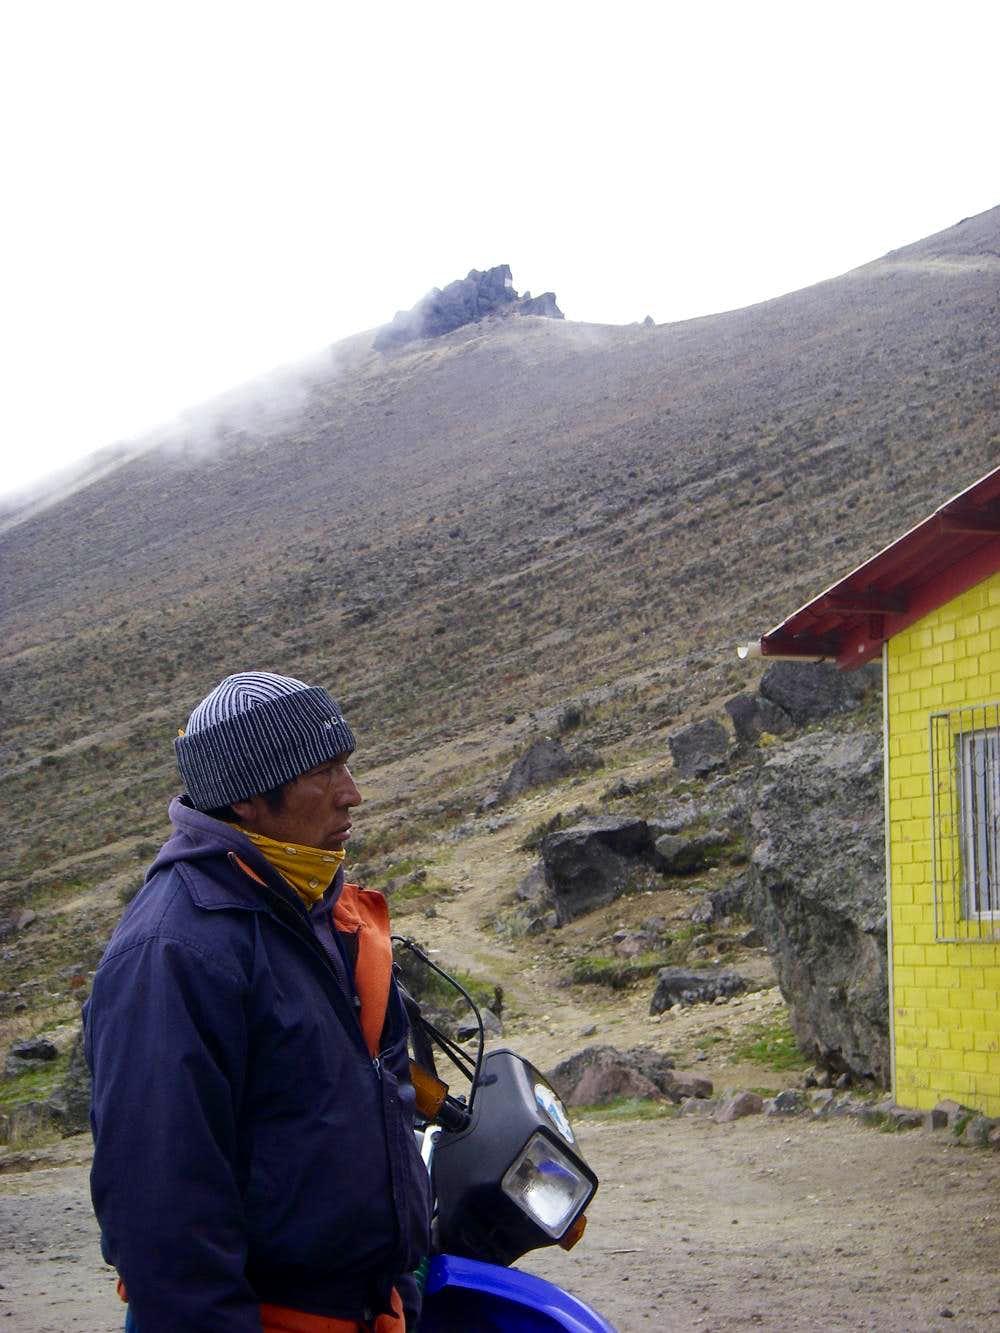 Guagua Pichincha Hut Caretaker